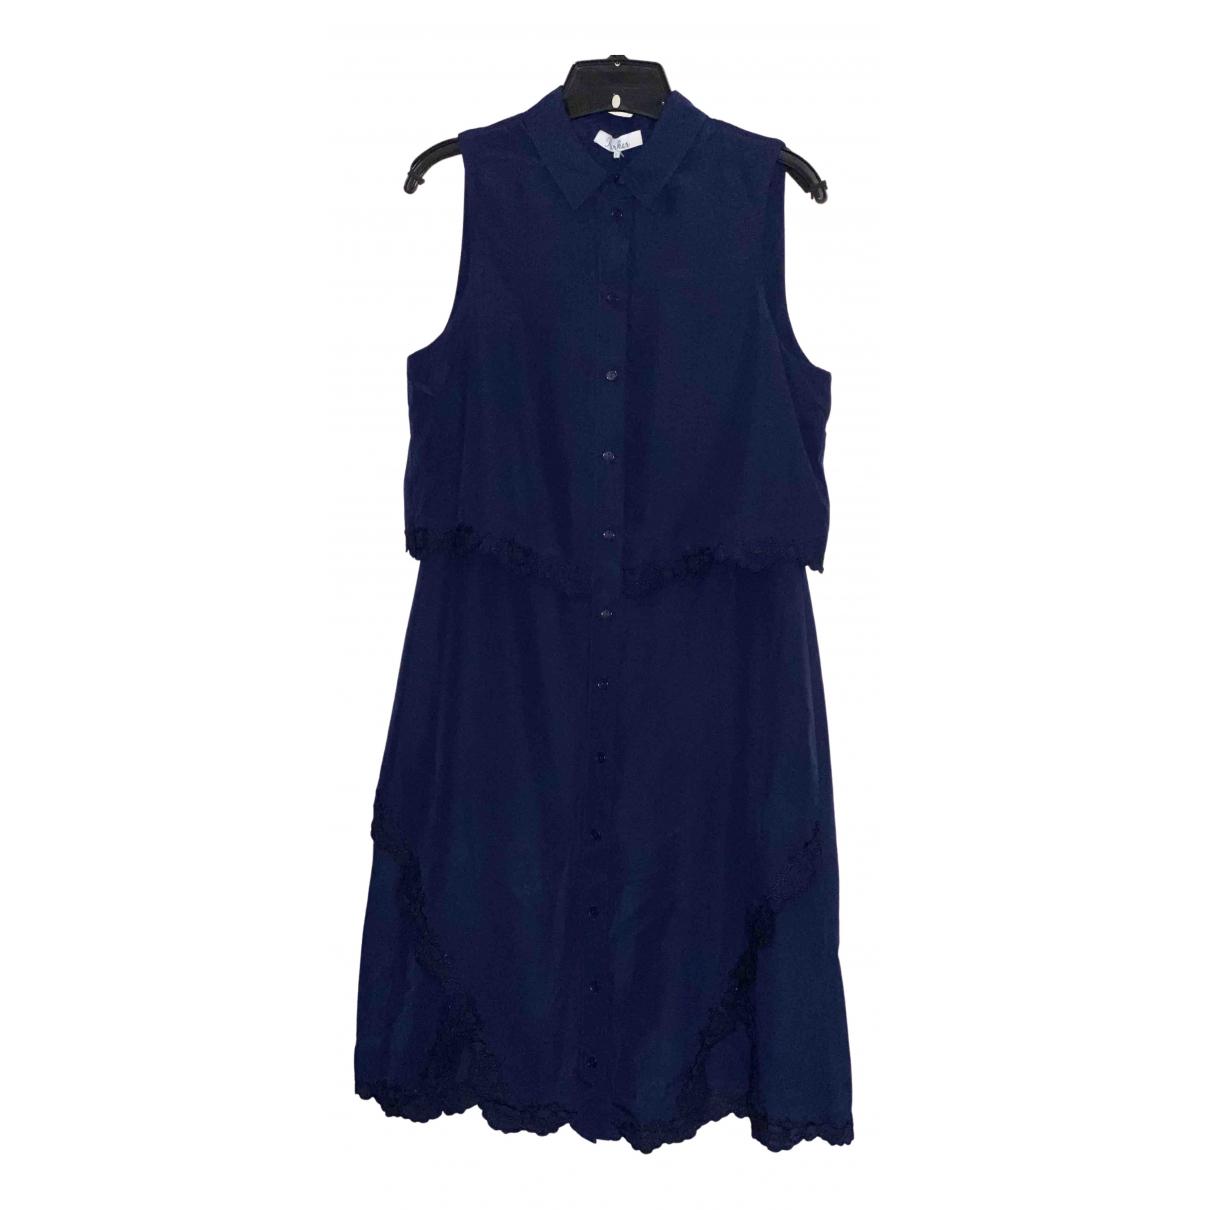 Parker Ny \N Kleid in  Blau Polyester